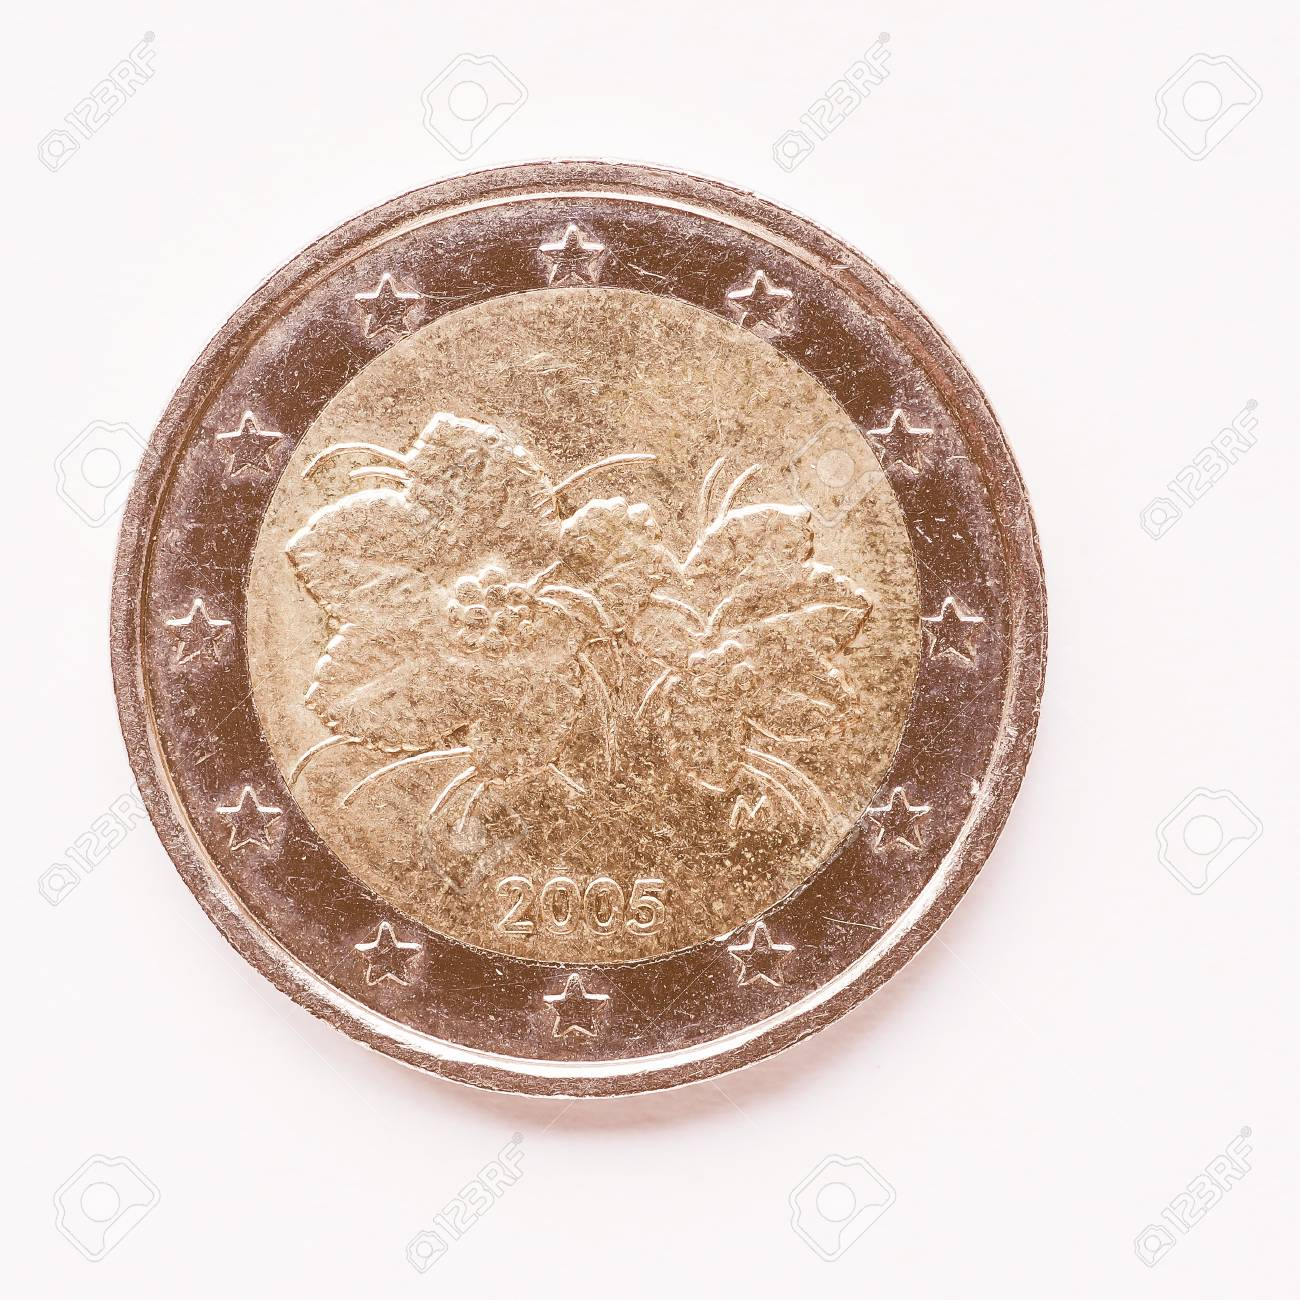 Währung Europas 2 Euro Münze Aus Finnland Jahrgang Lizenzfreie